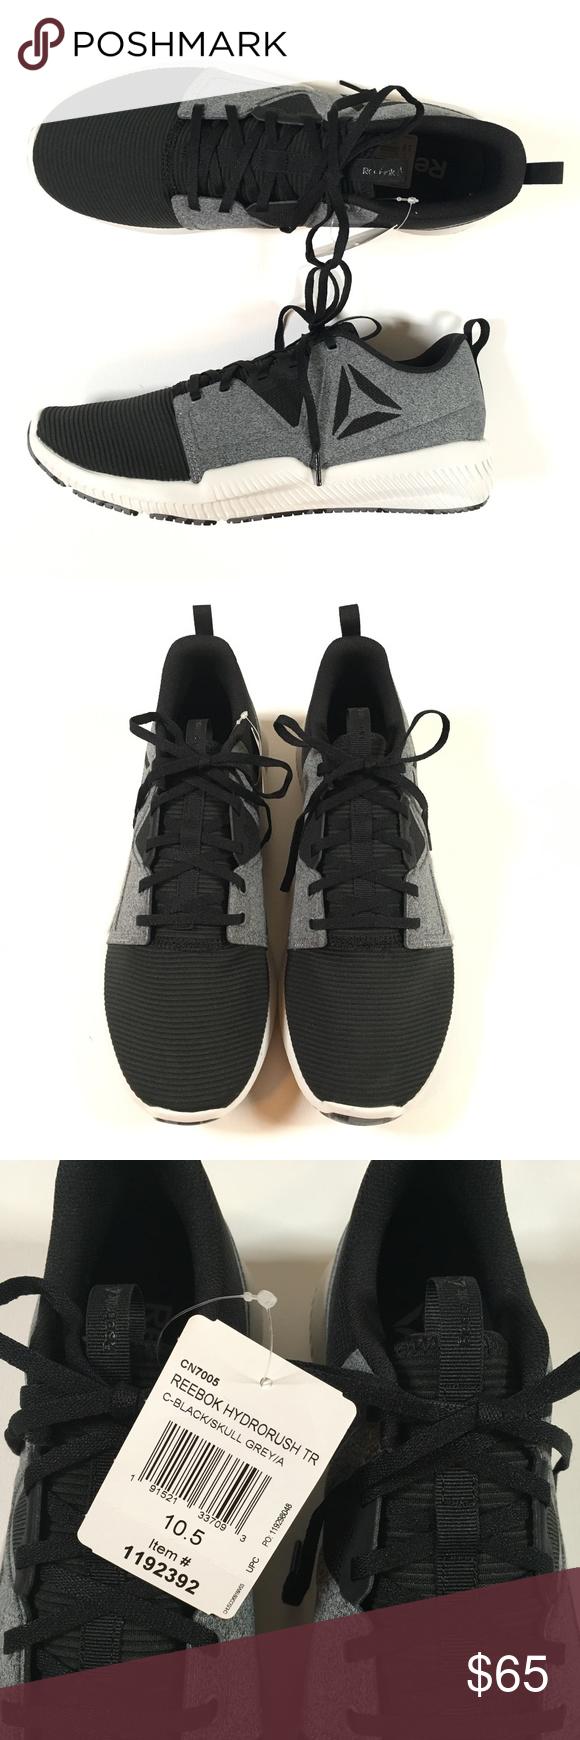 380f6d6dfa39 Reebok Hydrorush TR Training Shoes 10.5 Reebok Hydrorush TR Running  Training Sneakers -size mens 10.5